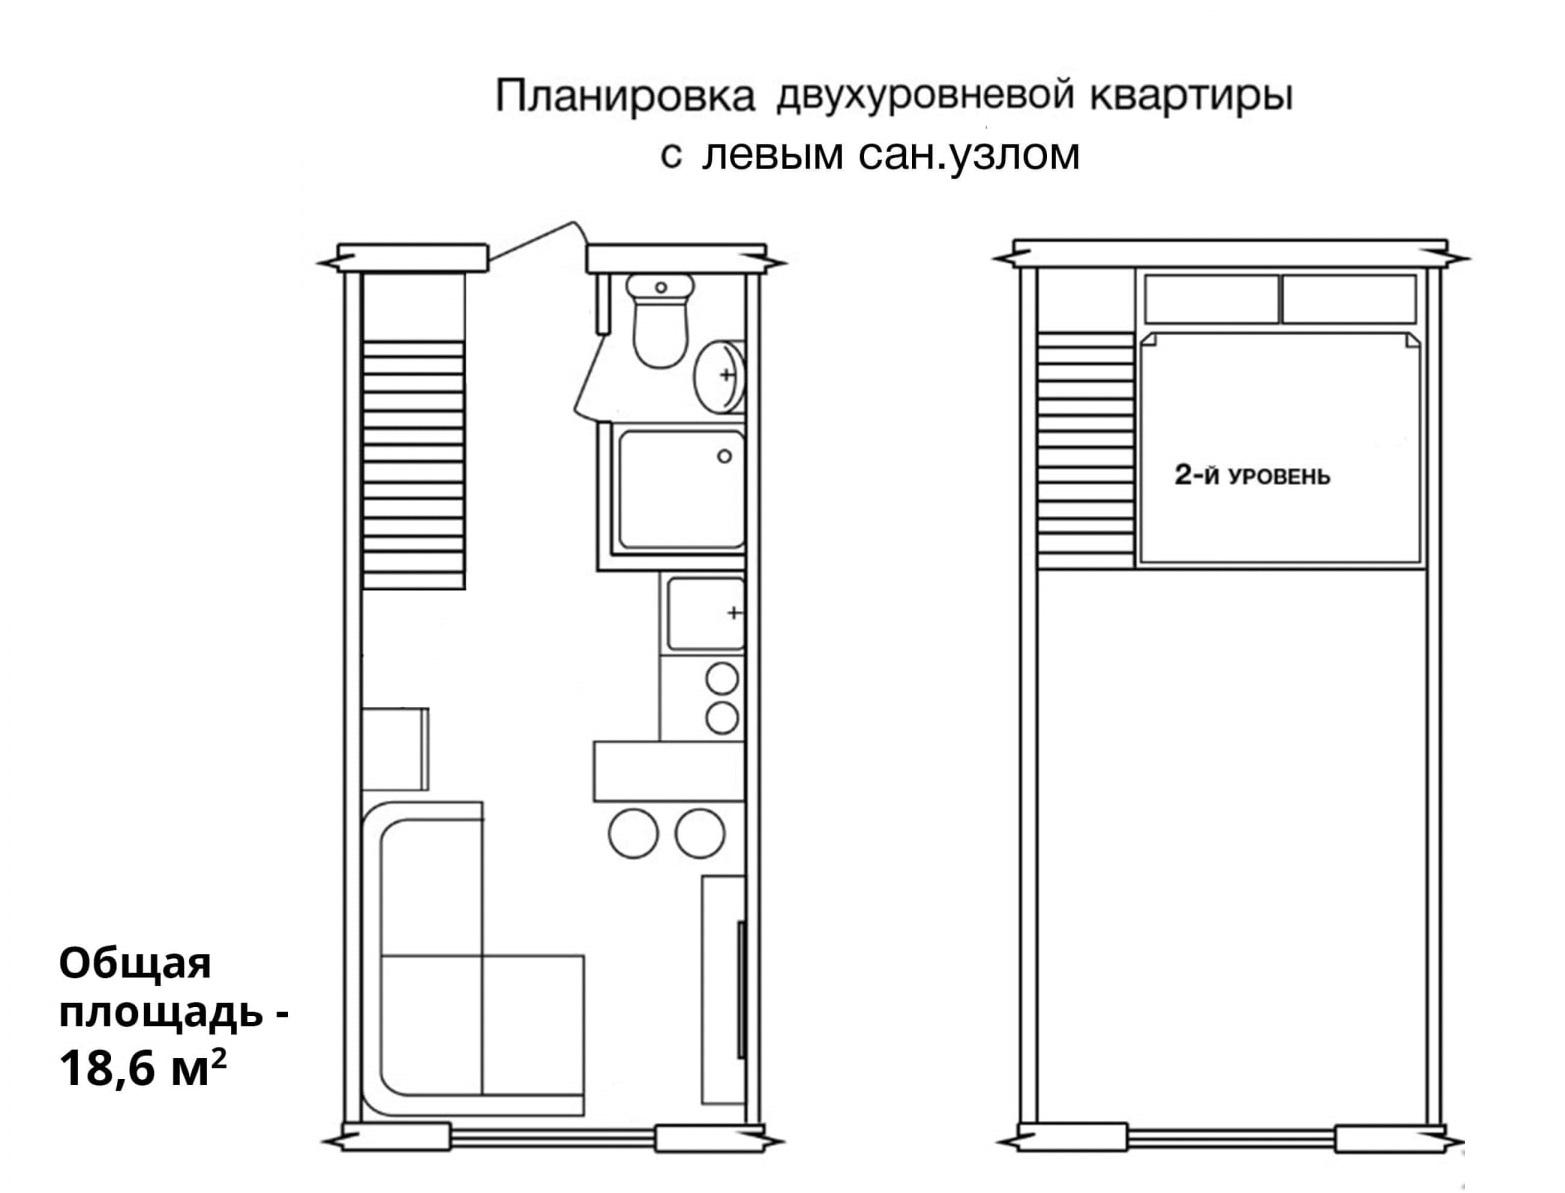 Квартал и микрорайон - концепции новостроек